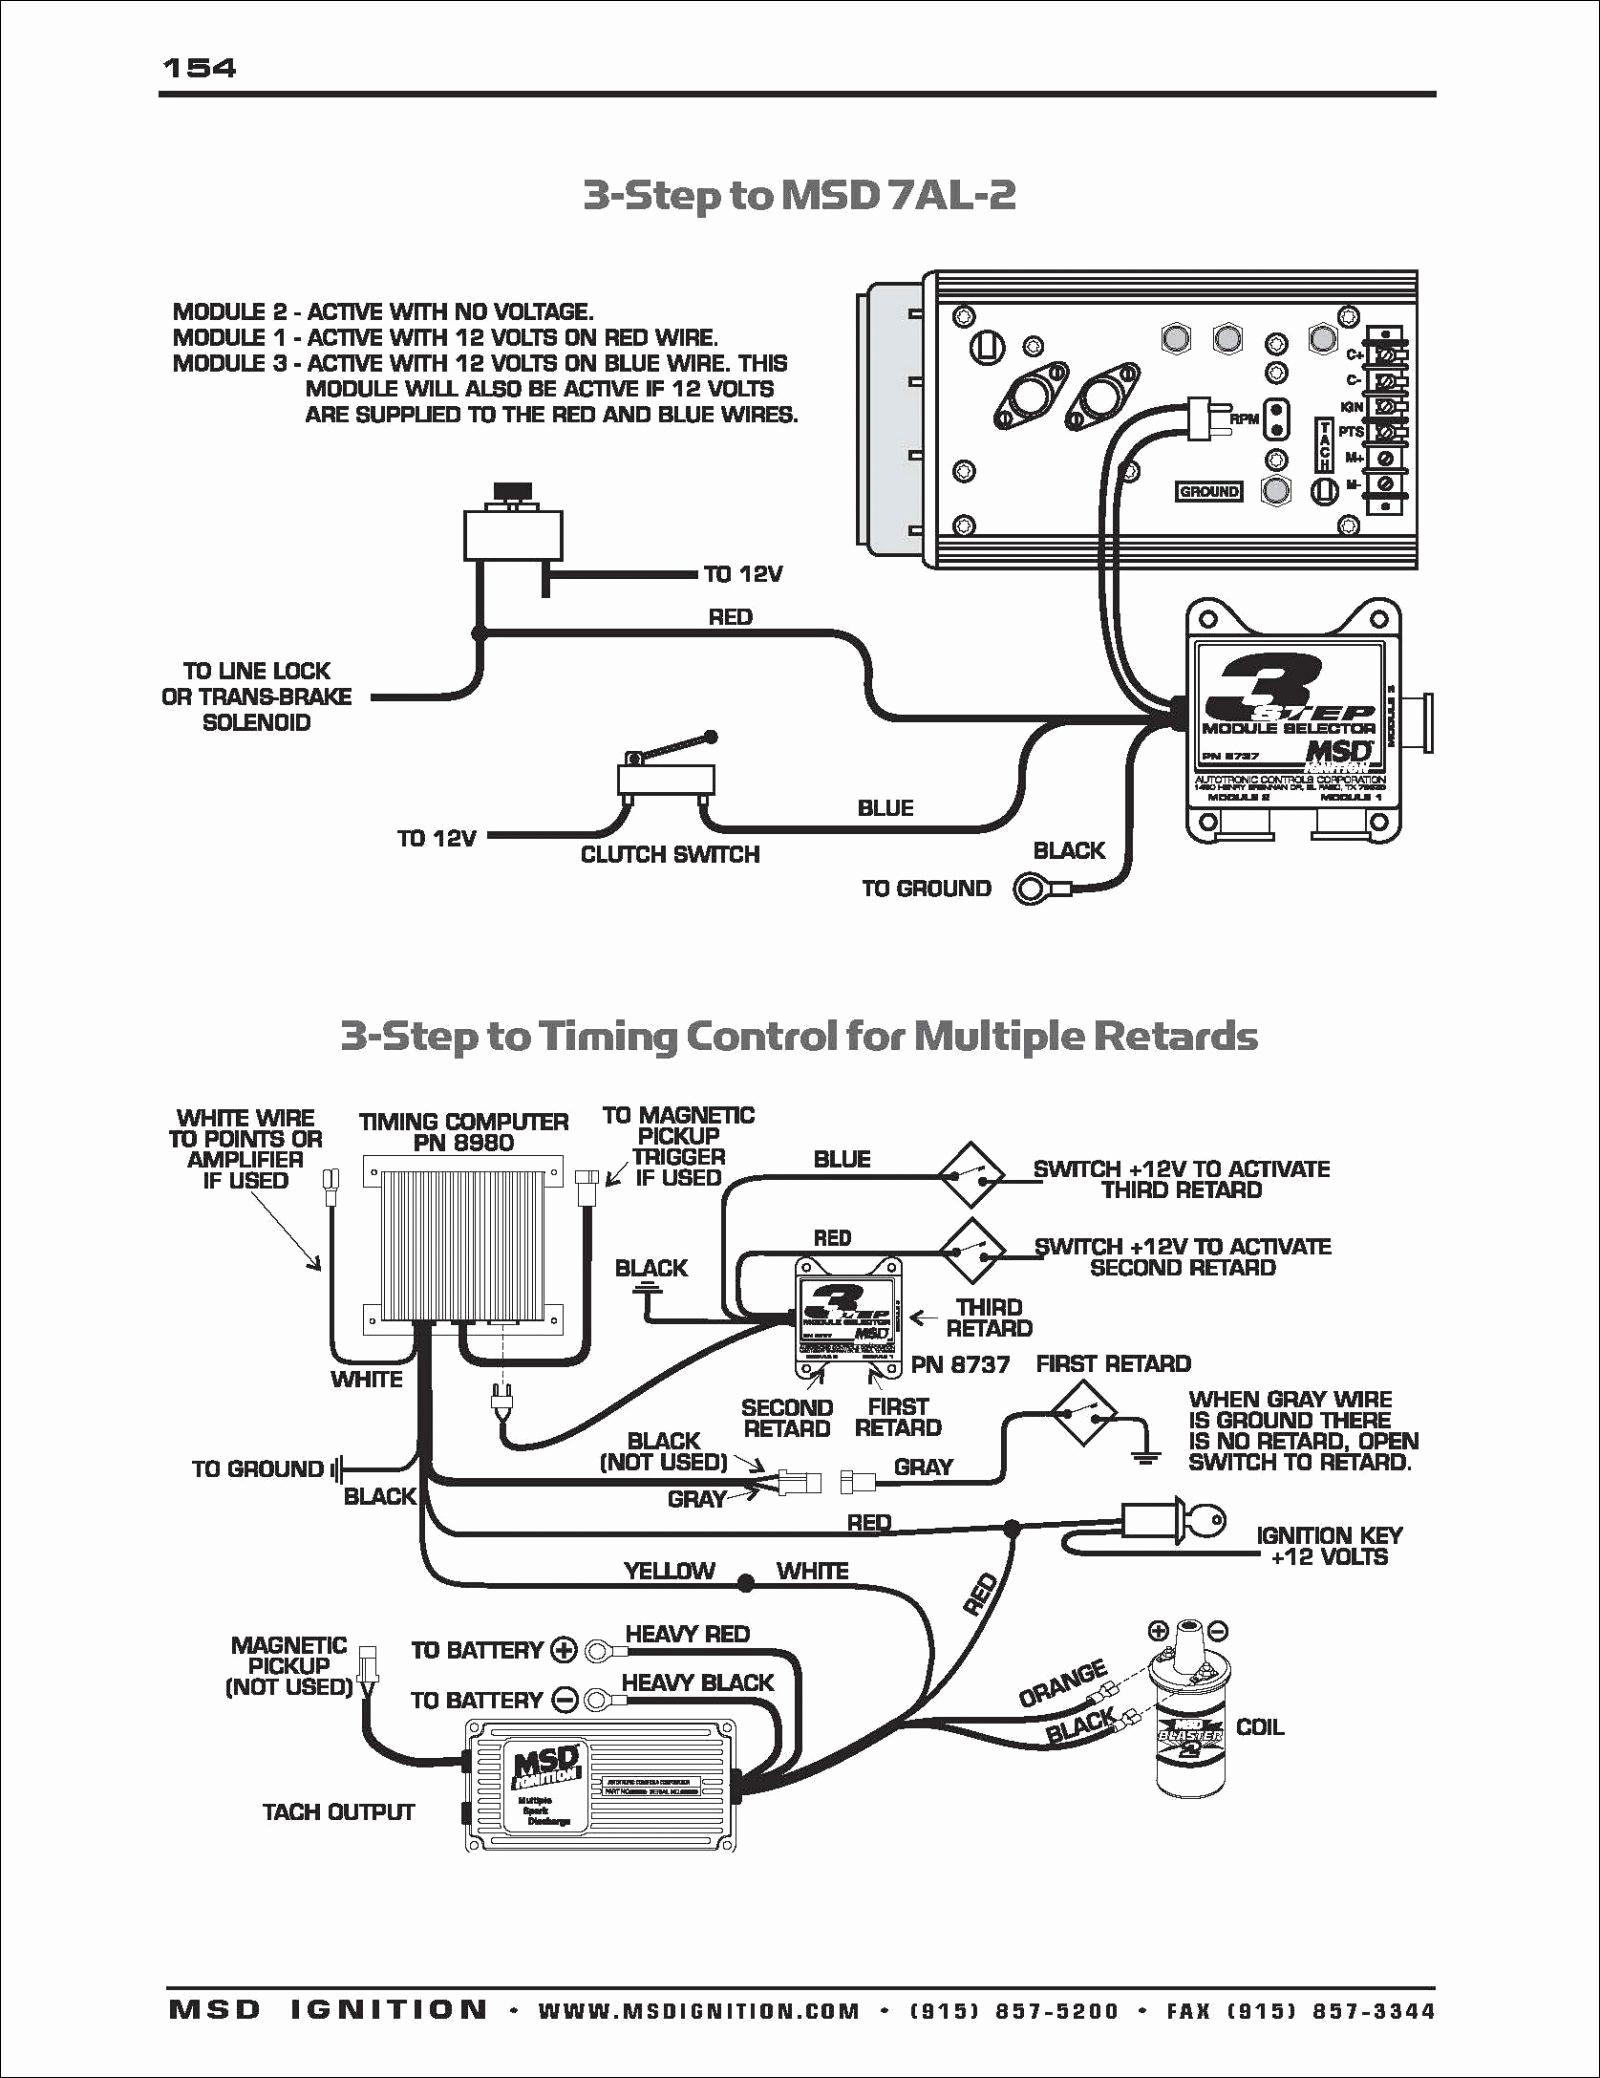 Diagram Kenwood Kdc Mp142 Wiring Diagram Full Version Hd Quality Wiring Diagram Printerdiagram Cefalubb It